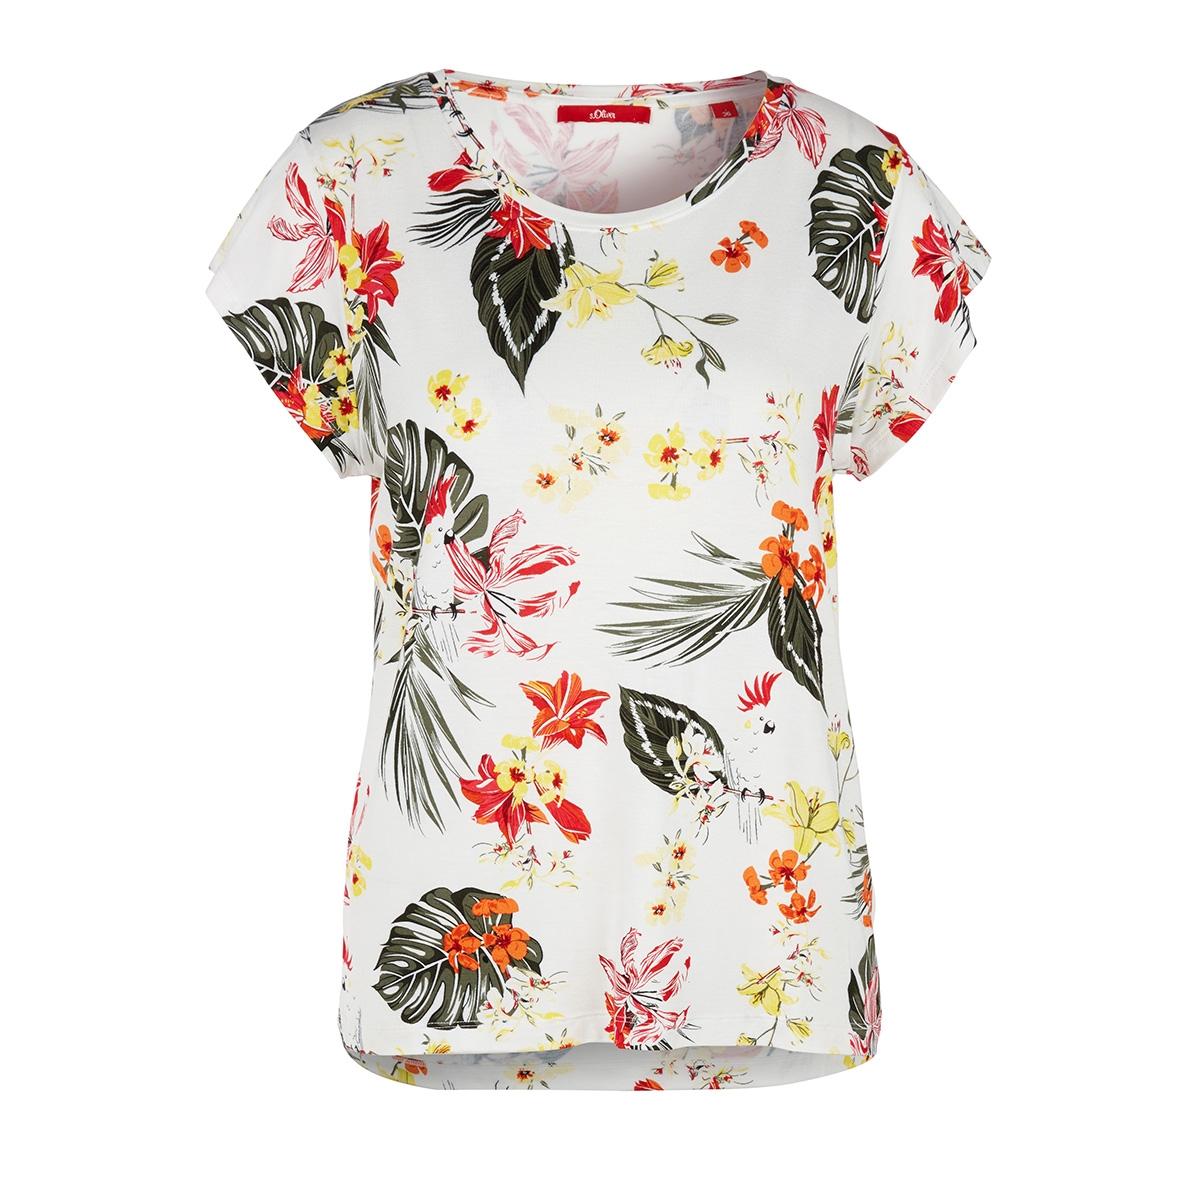 jersey shirt met all over motief 14004324697 s.oliver t-shirt 02b1